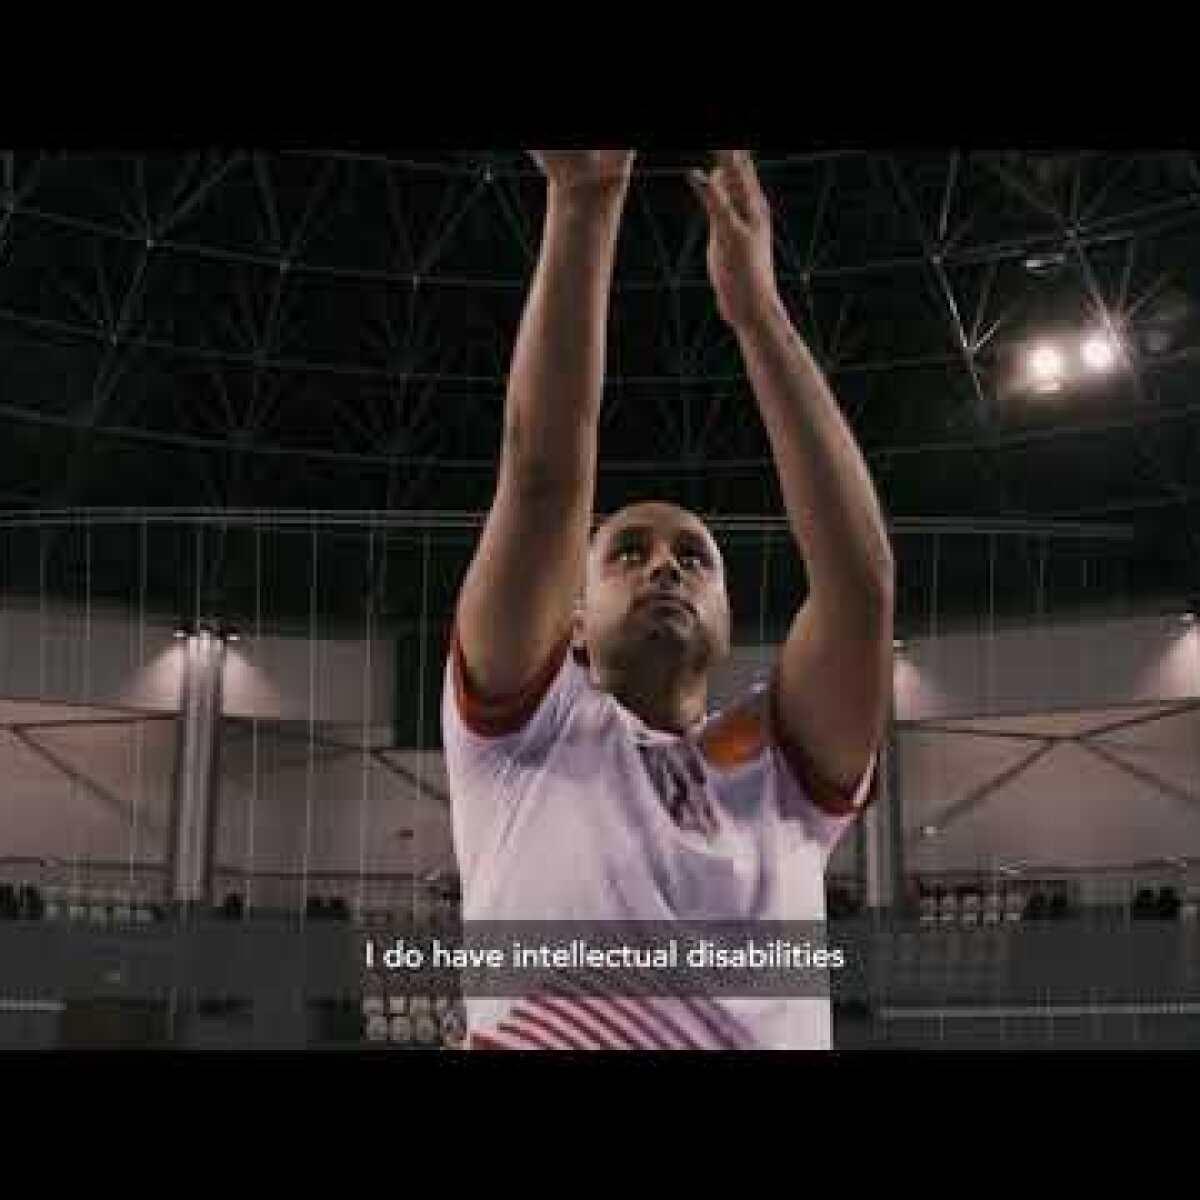 Watch Butti Al Sheezawi, Special Olympics Basketball